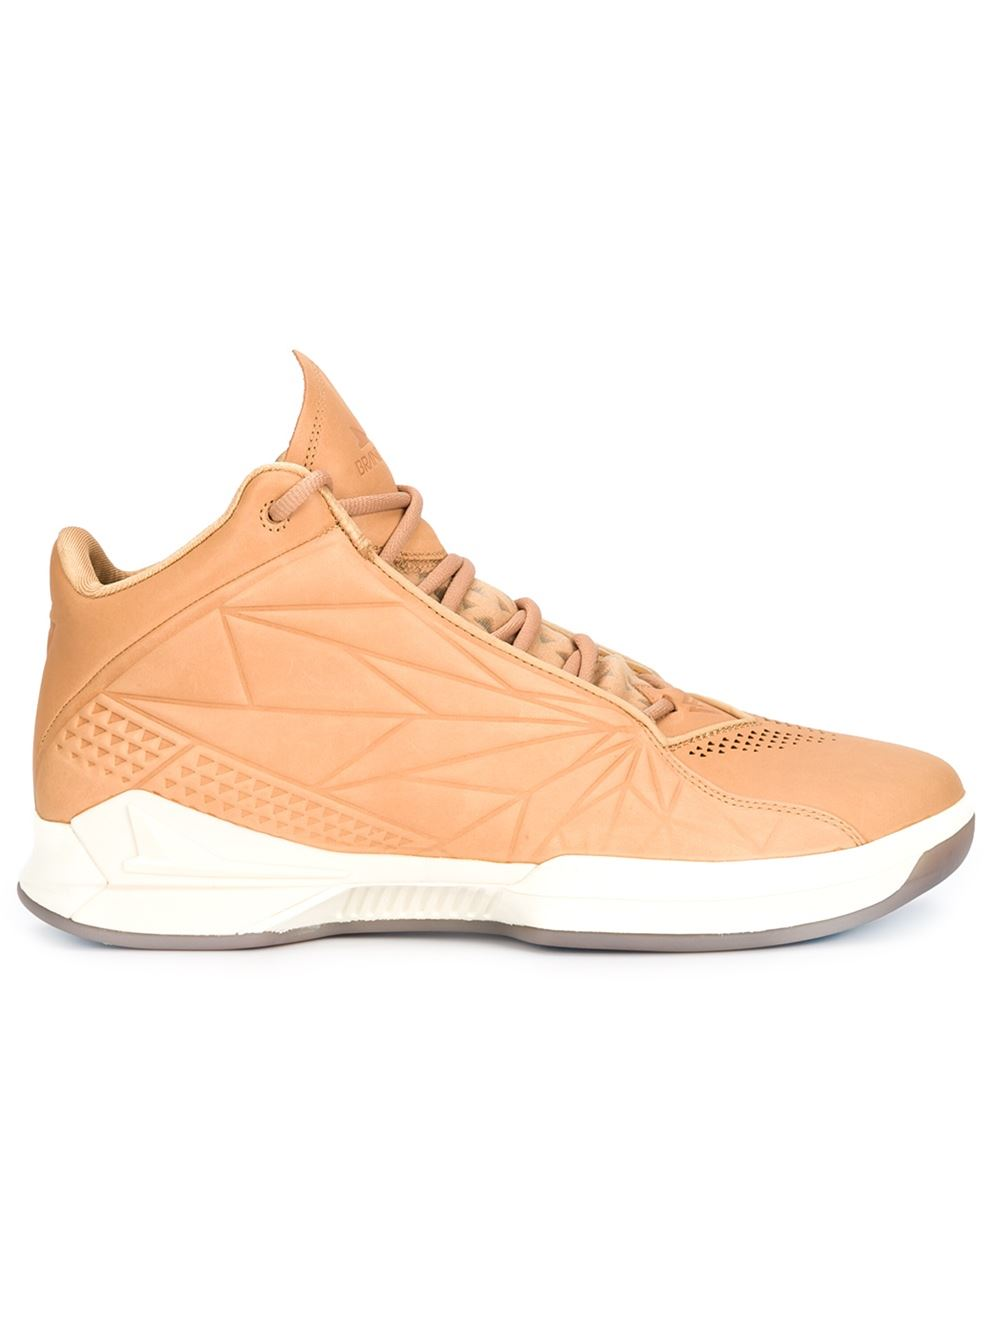 Force Vector hi top sneakers, £162.13, www.farfetch.com